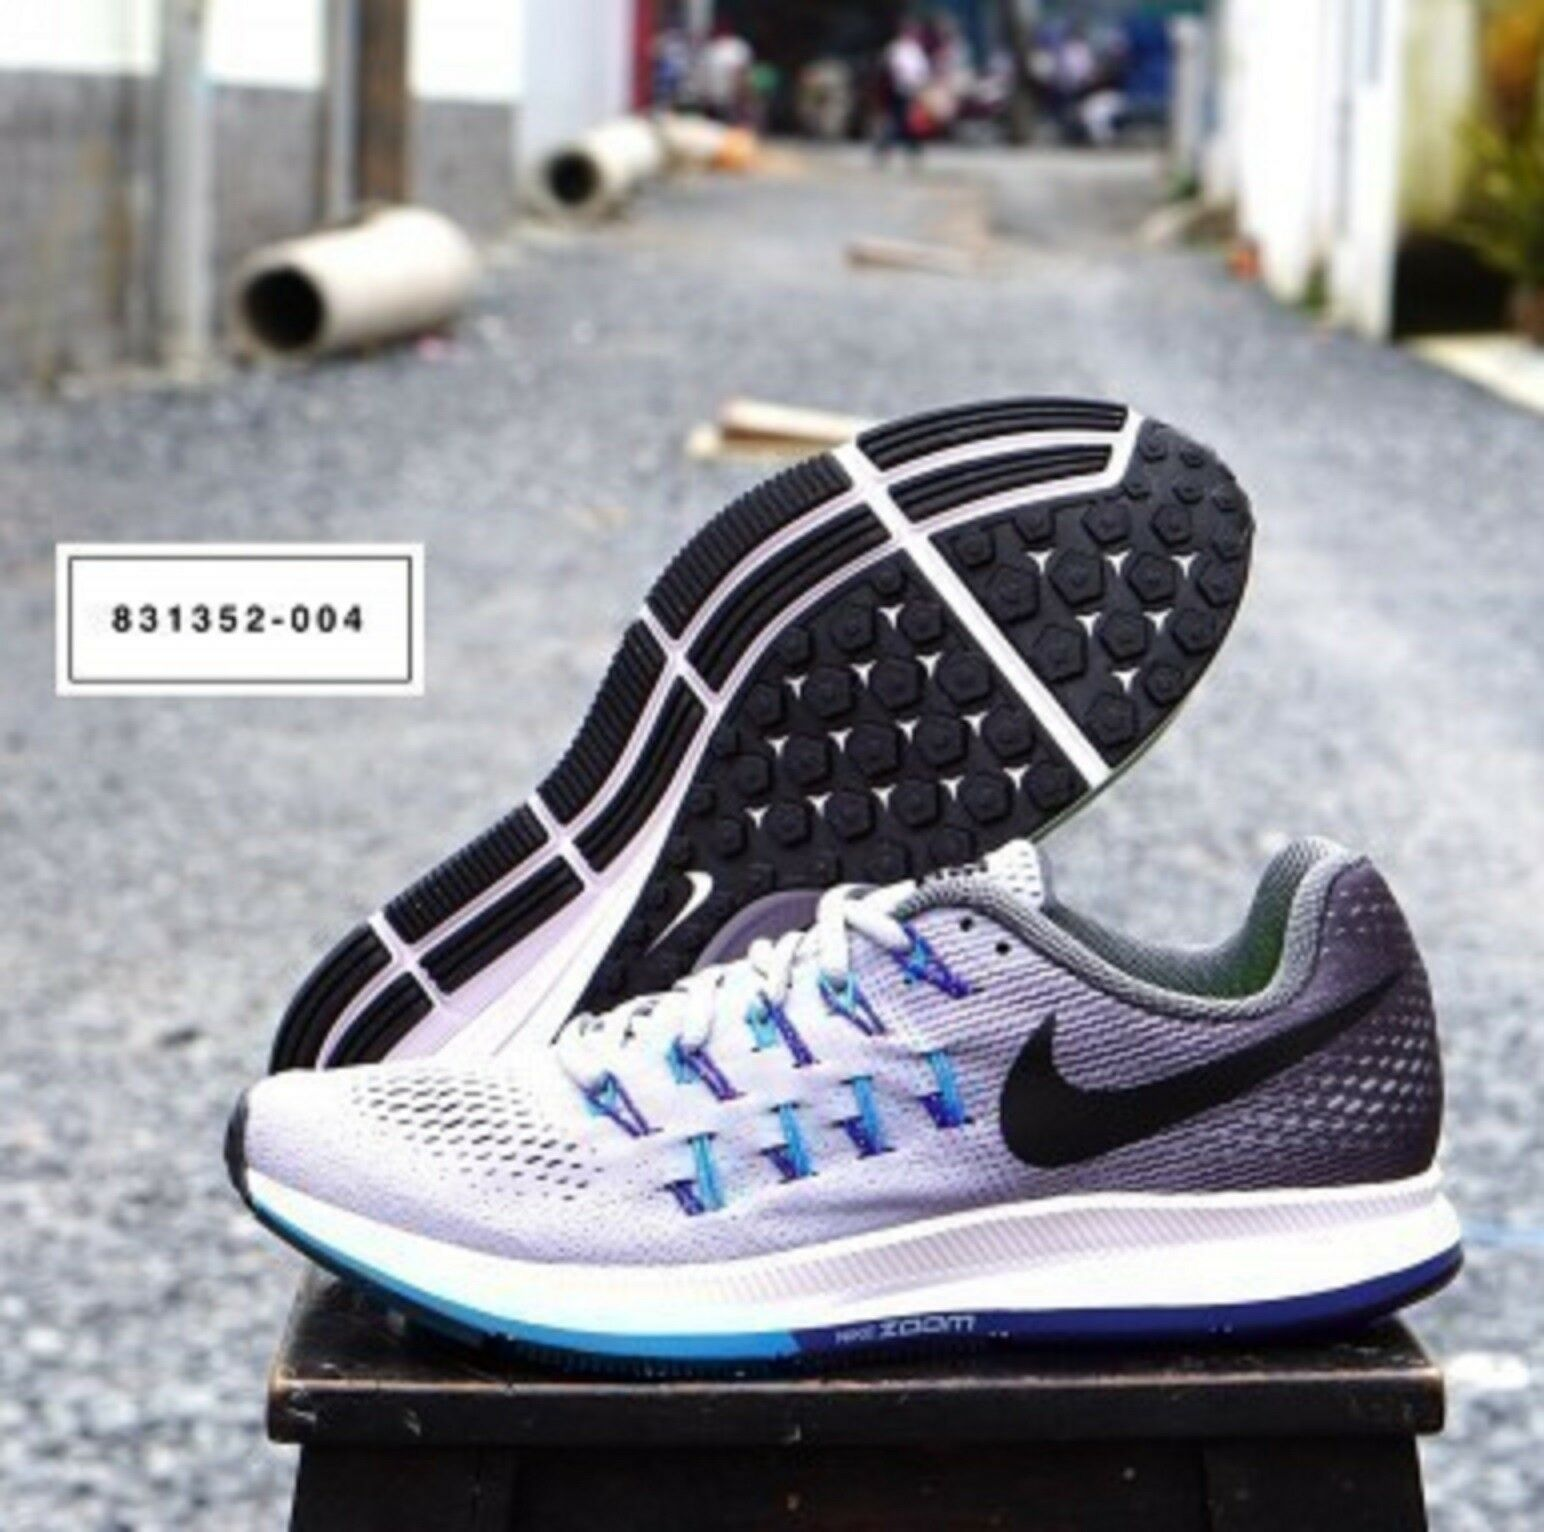 Nike Luft Zoom Pegasus 33 Herren Laufschuhe Turnschuhe 831352-004 UK 6,5 Eu 40.5 König der Masse